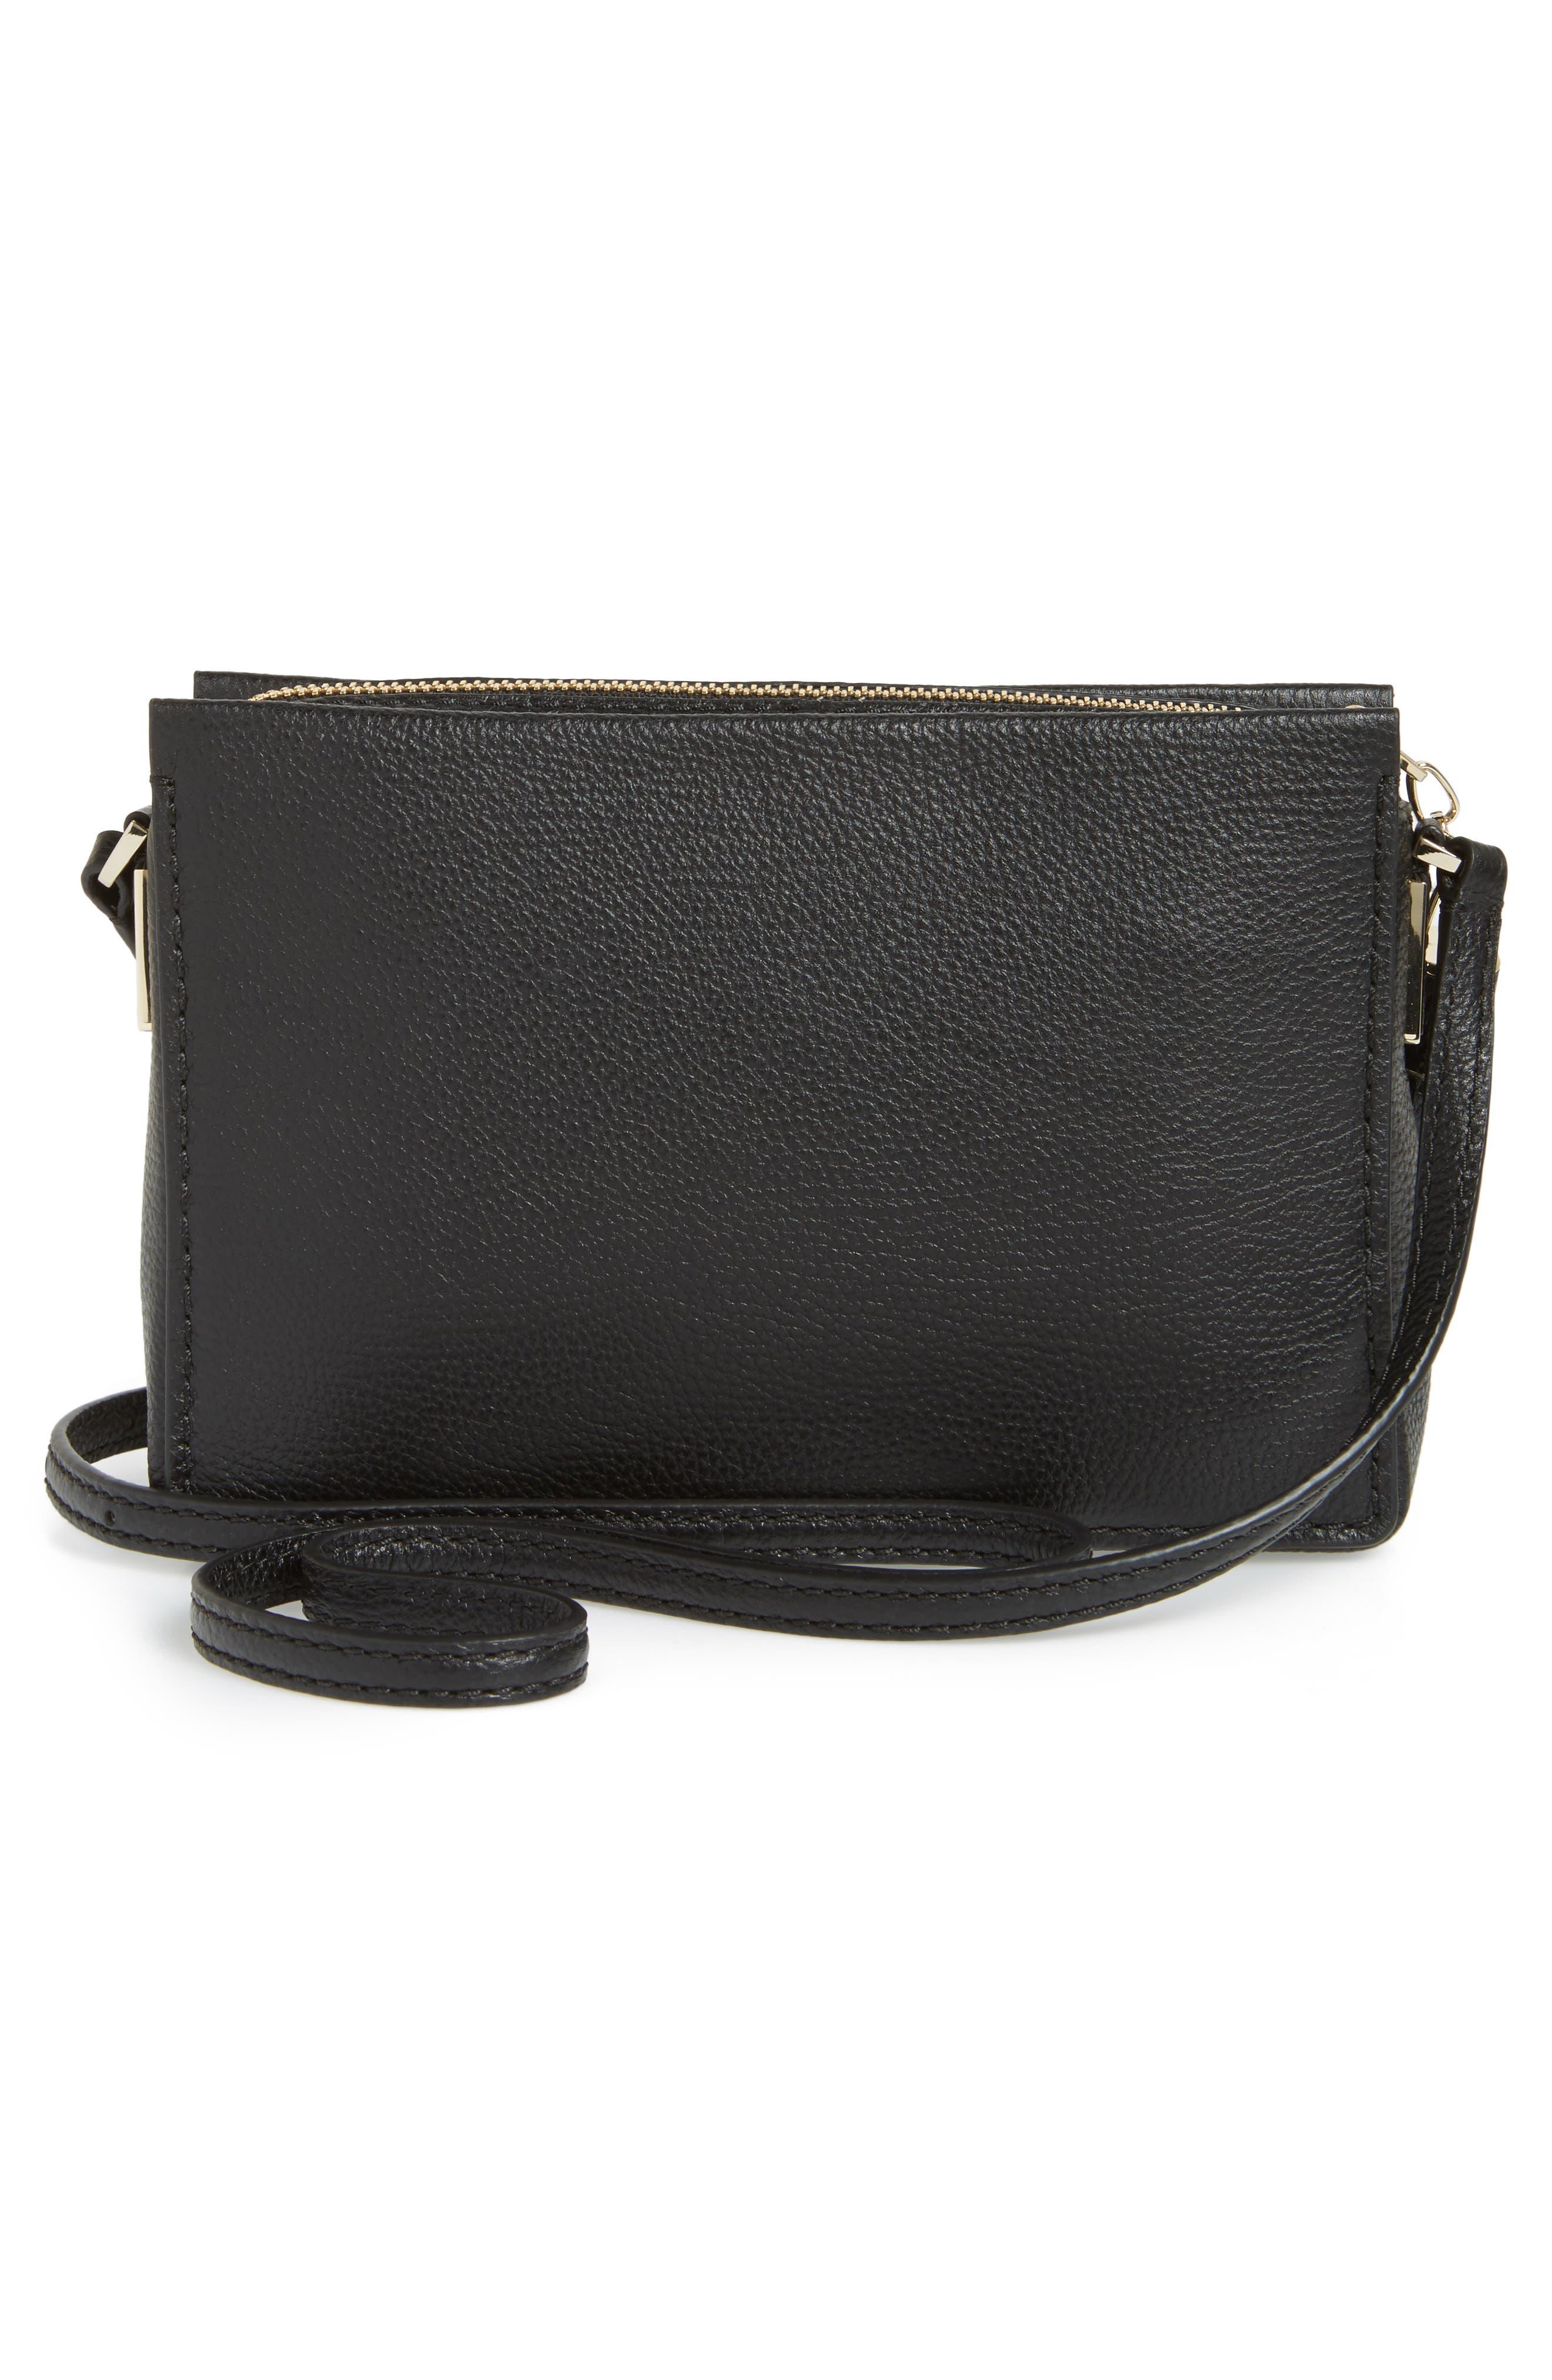 kingston drive - gillian leather crossbody bag,                             Alternate thumbnail 3, color,                             Black